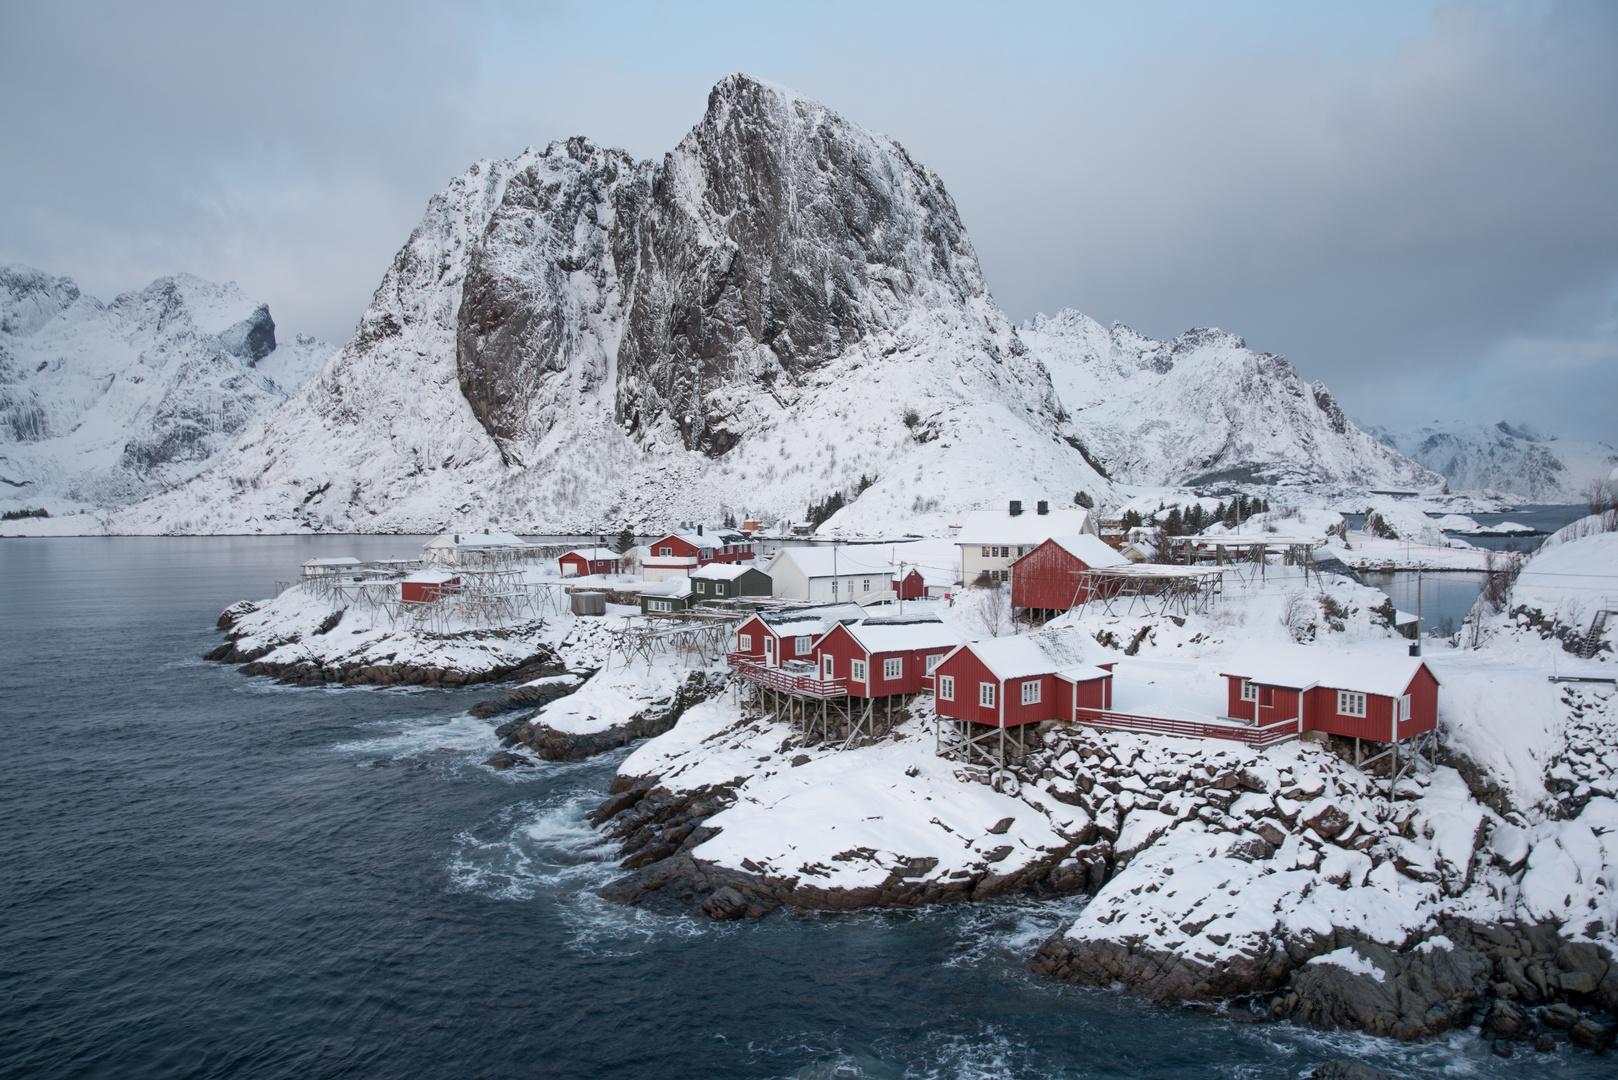 Winter in Reine, Lofoten